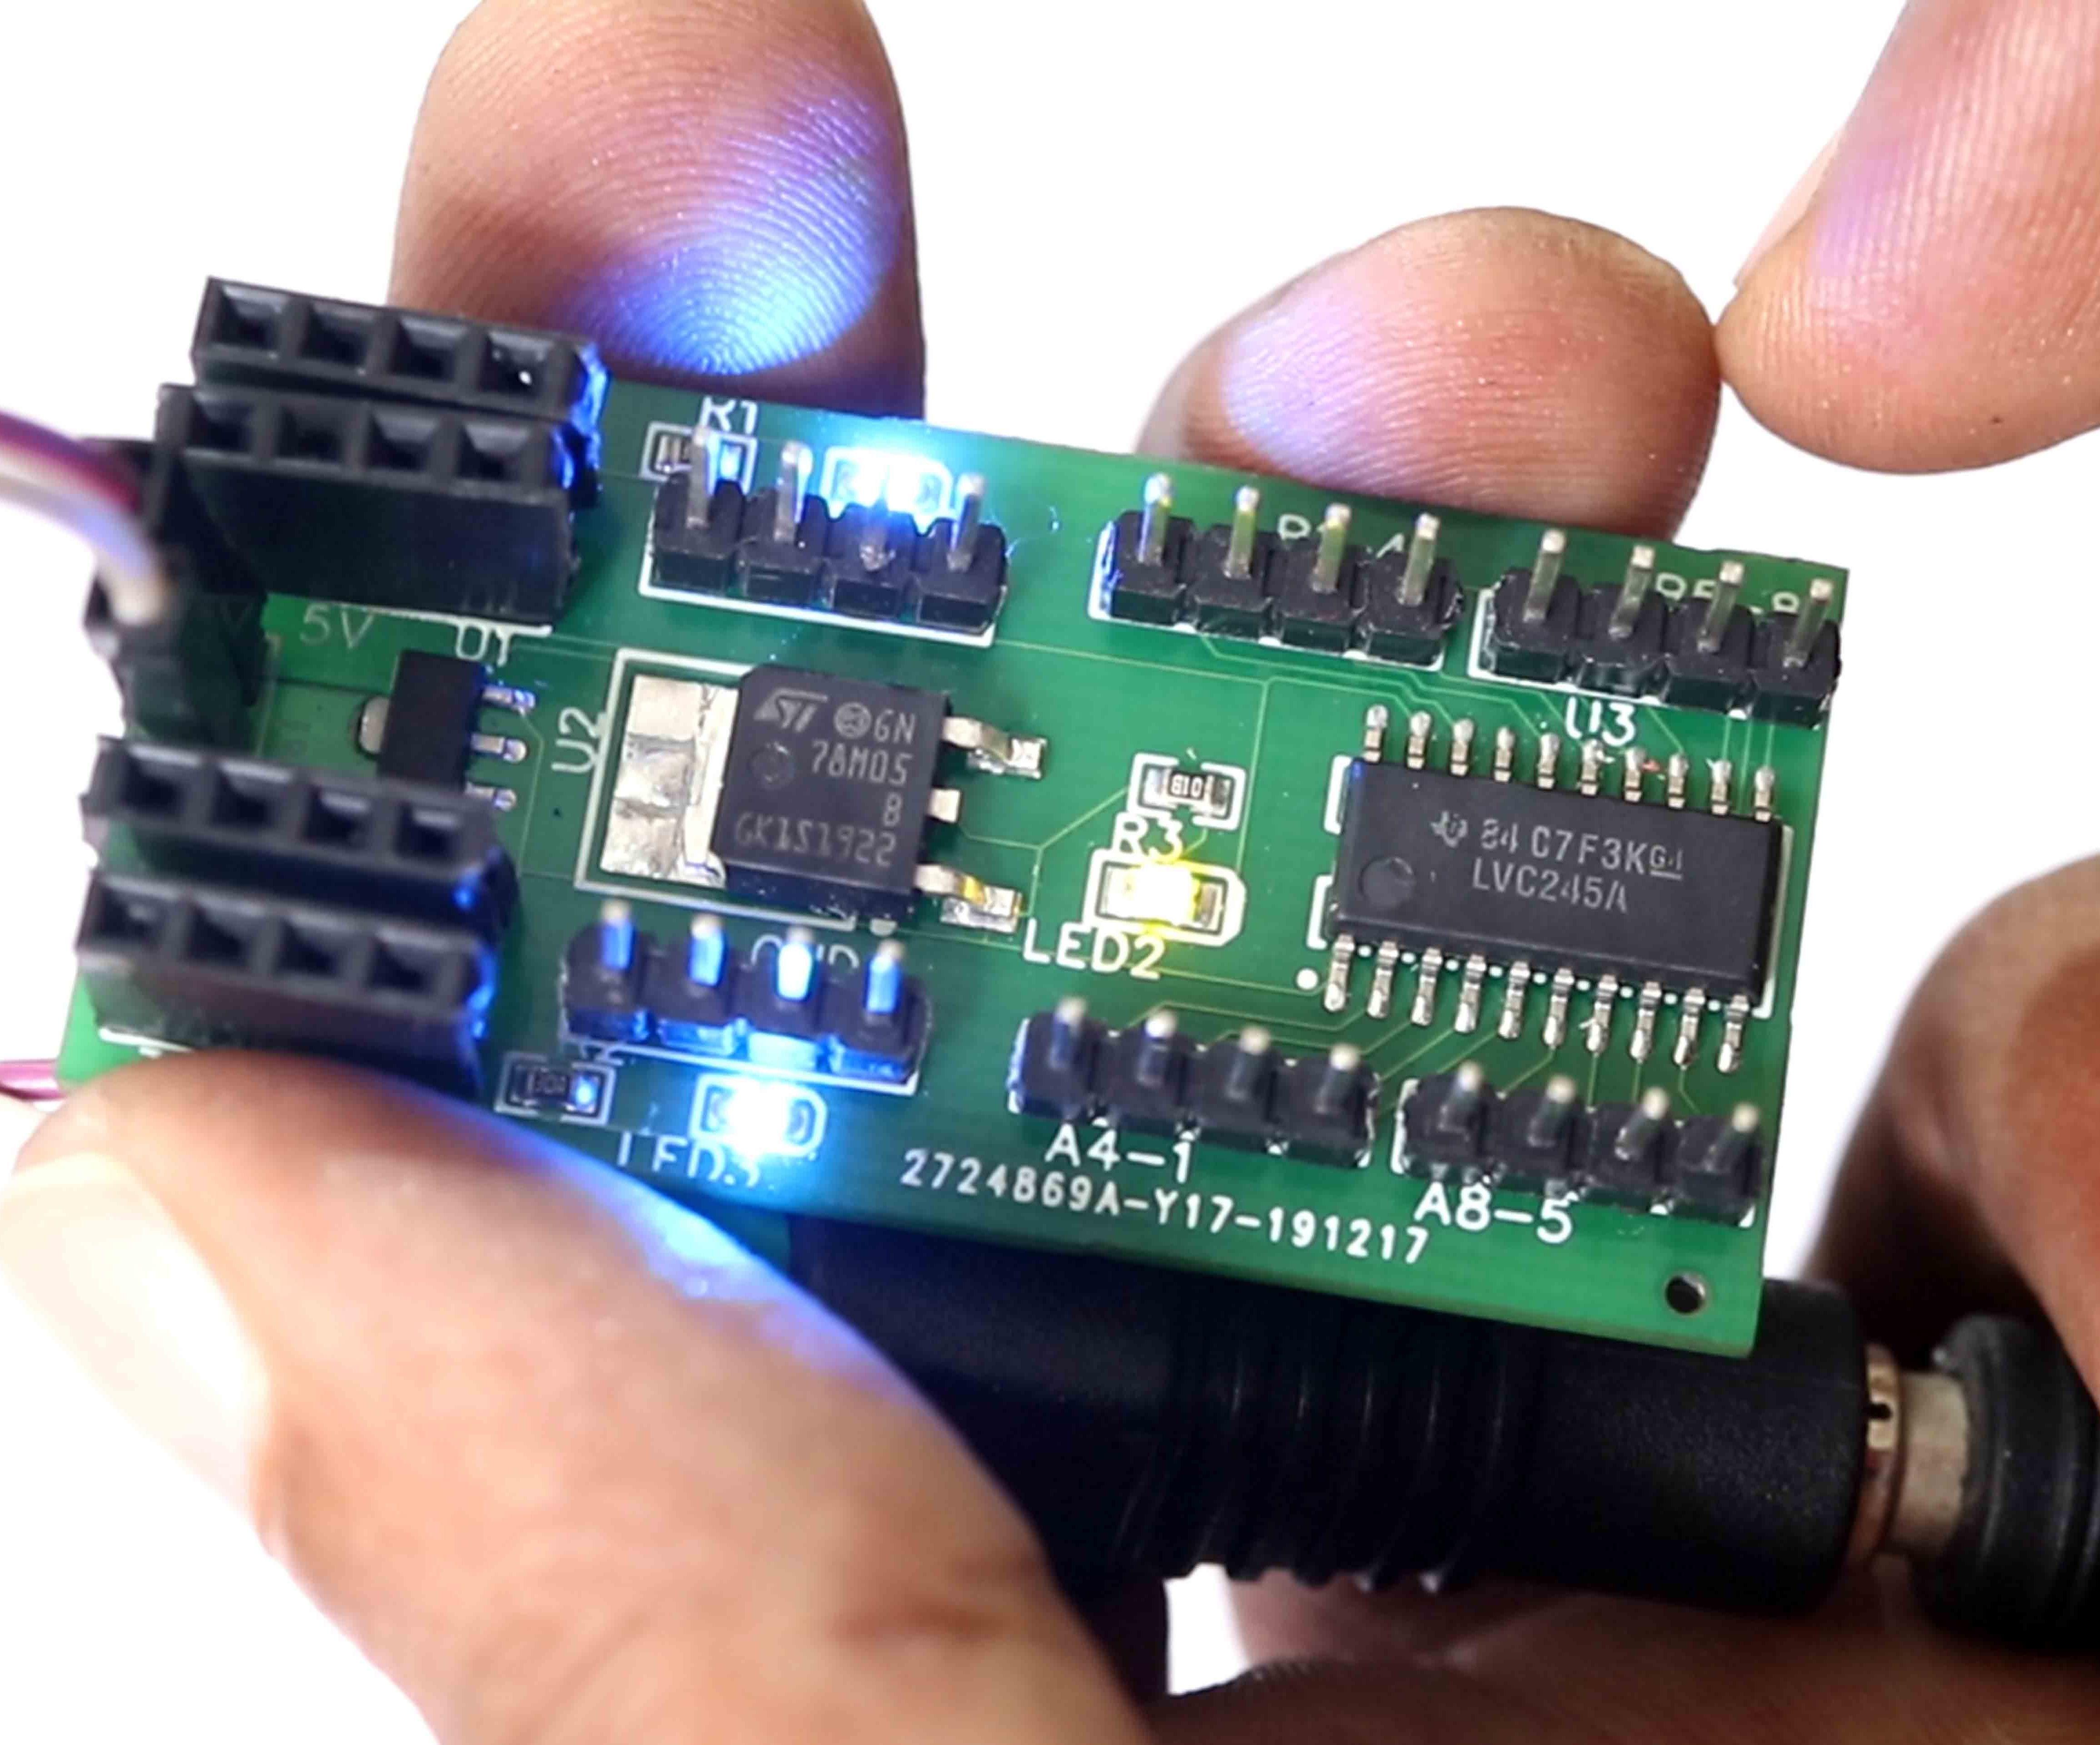 Simple DIY Logic Converter for 3.3V Devices